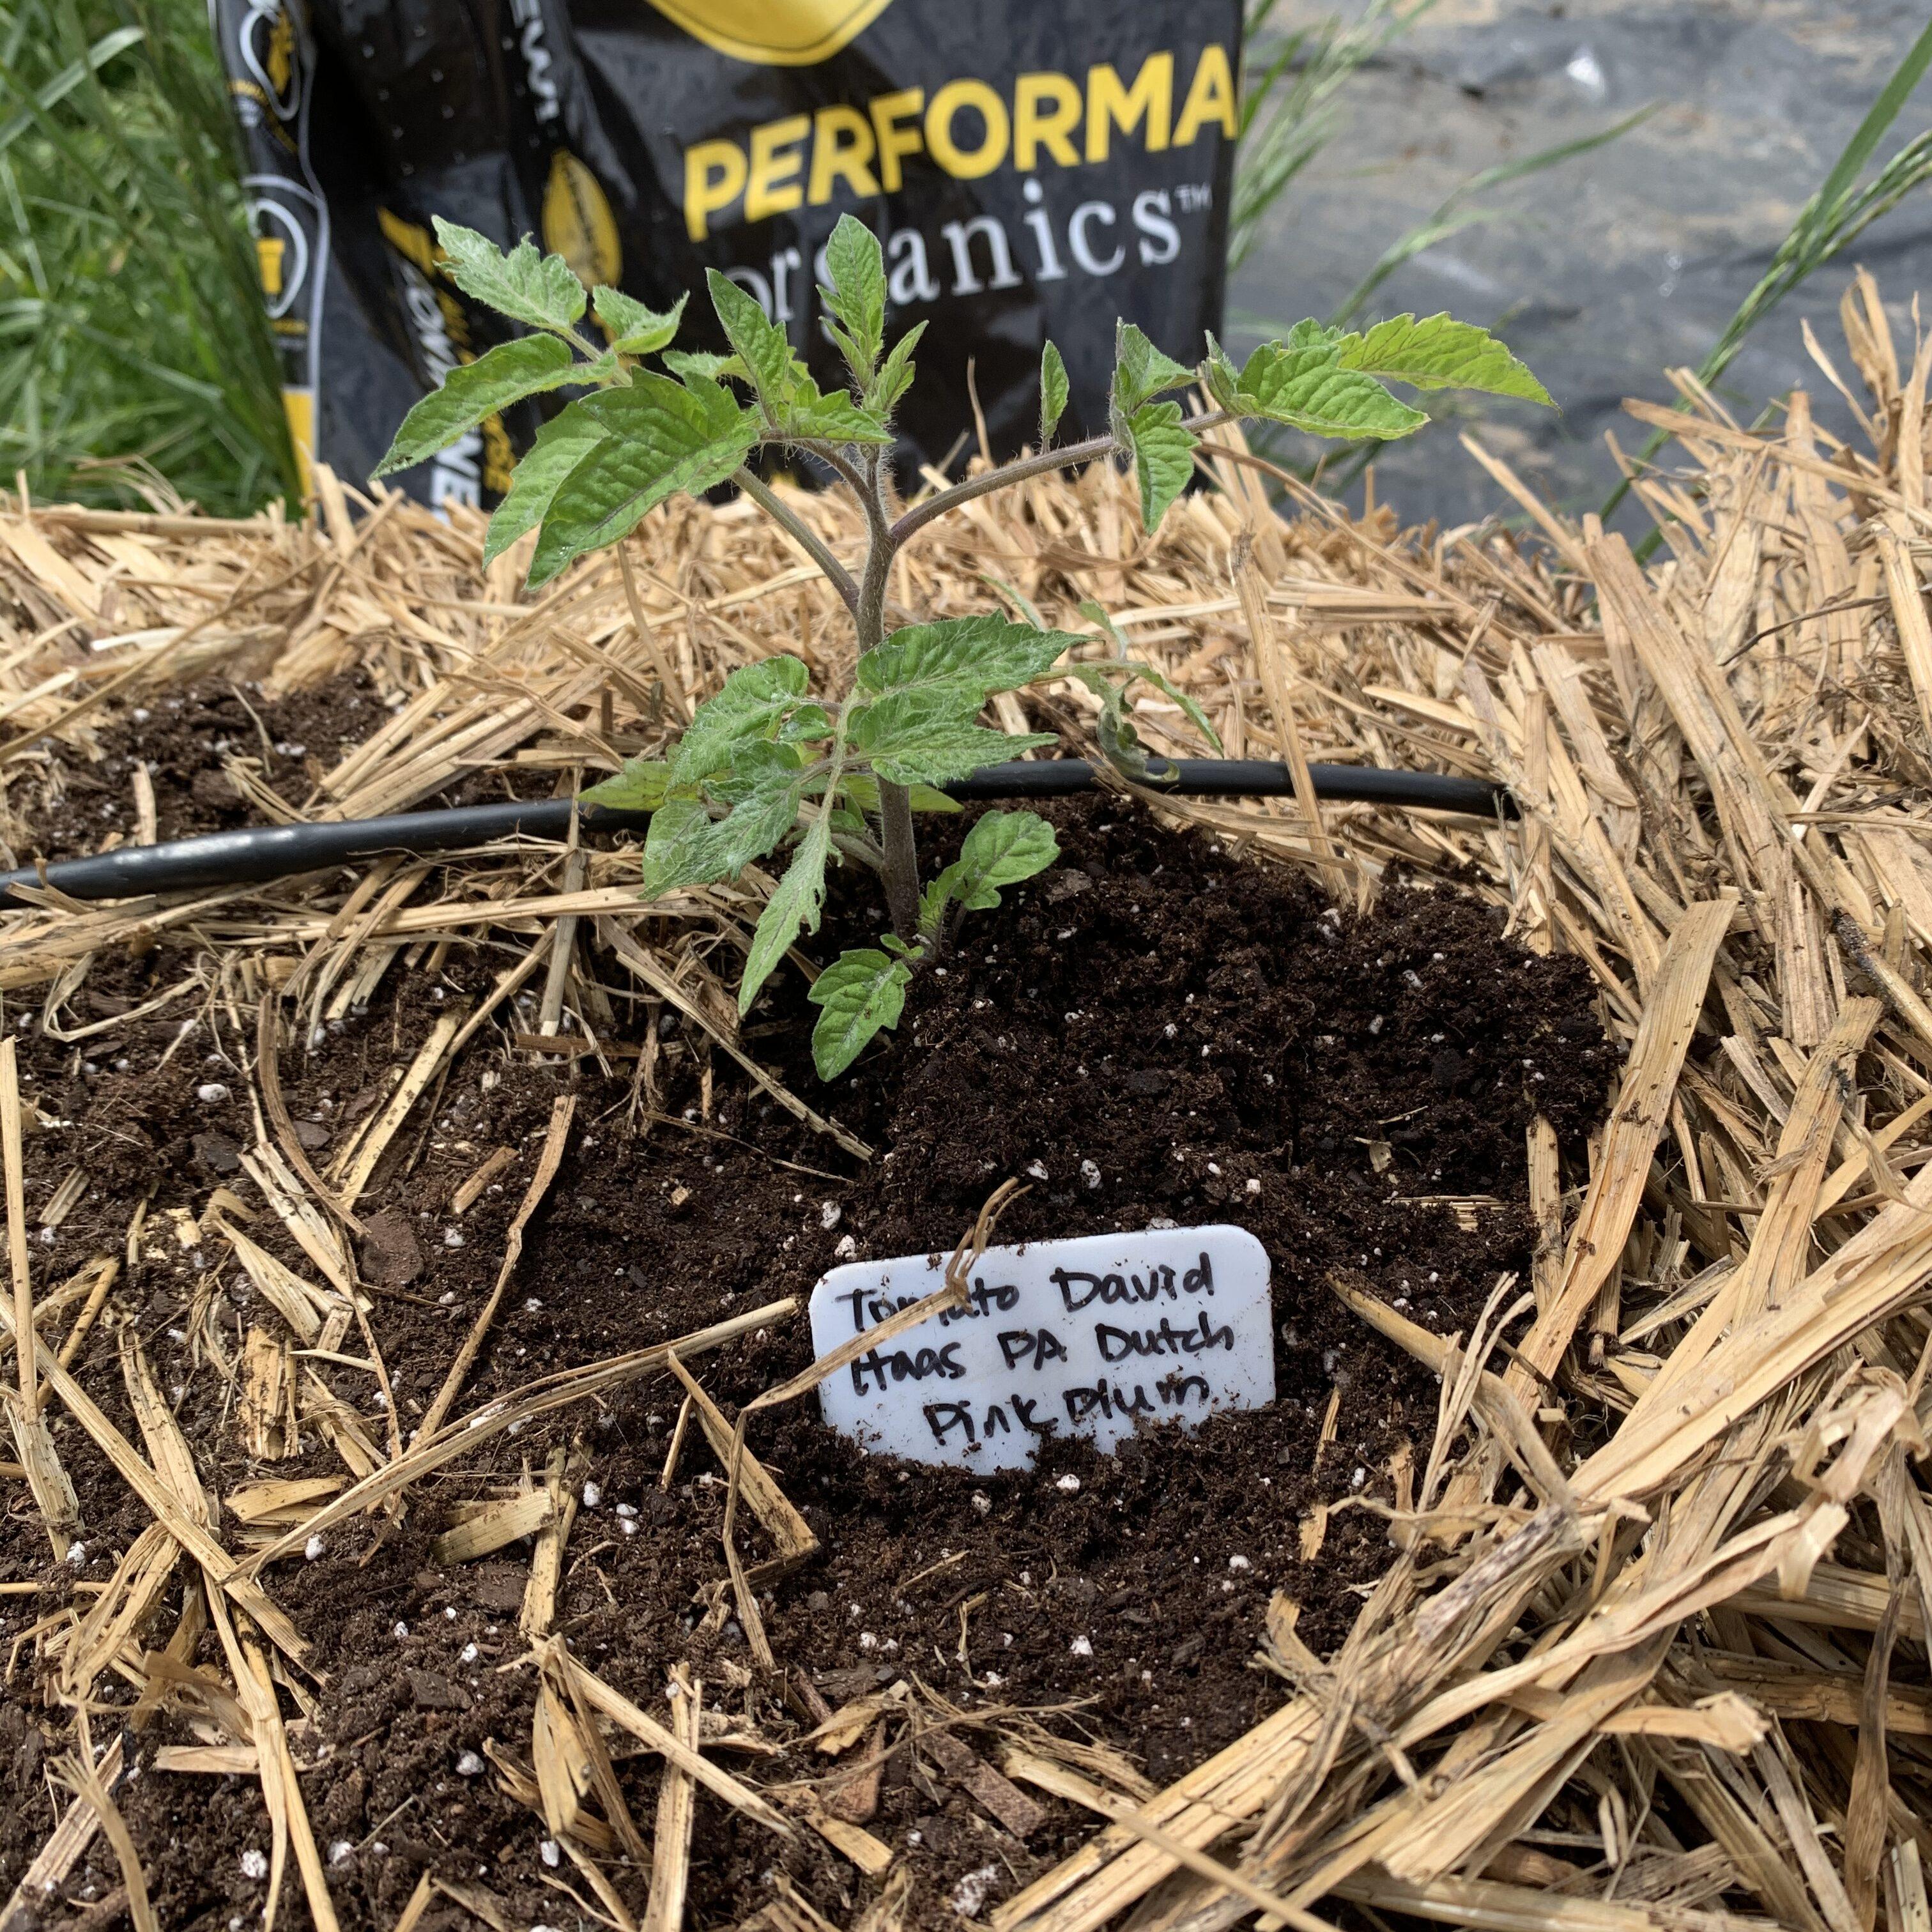 D56A34EA 17AE 4EA8 BB2E 36F83A919C2E Tomato planting day!